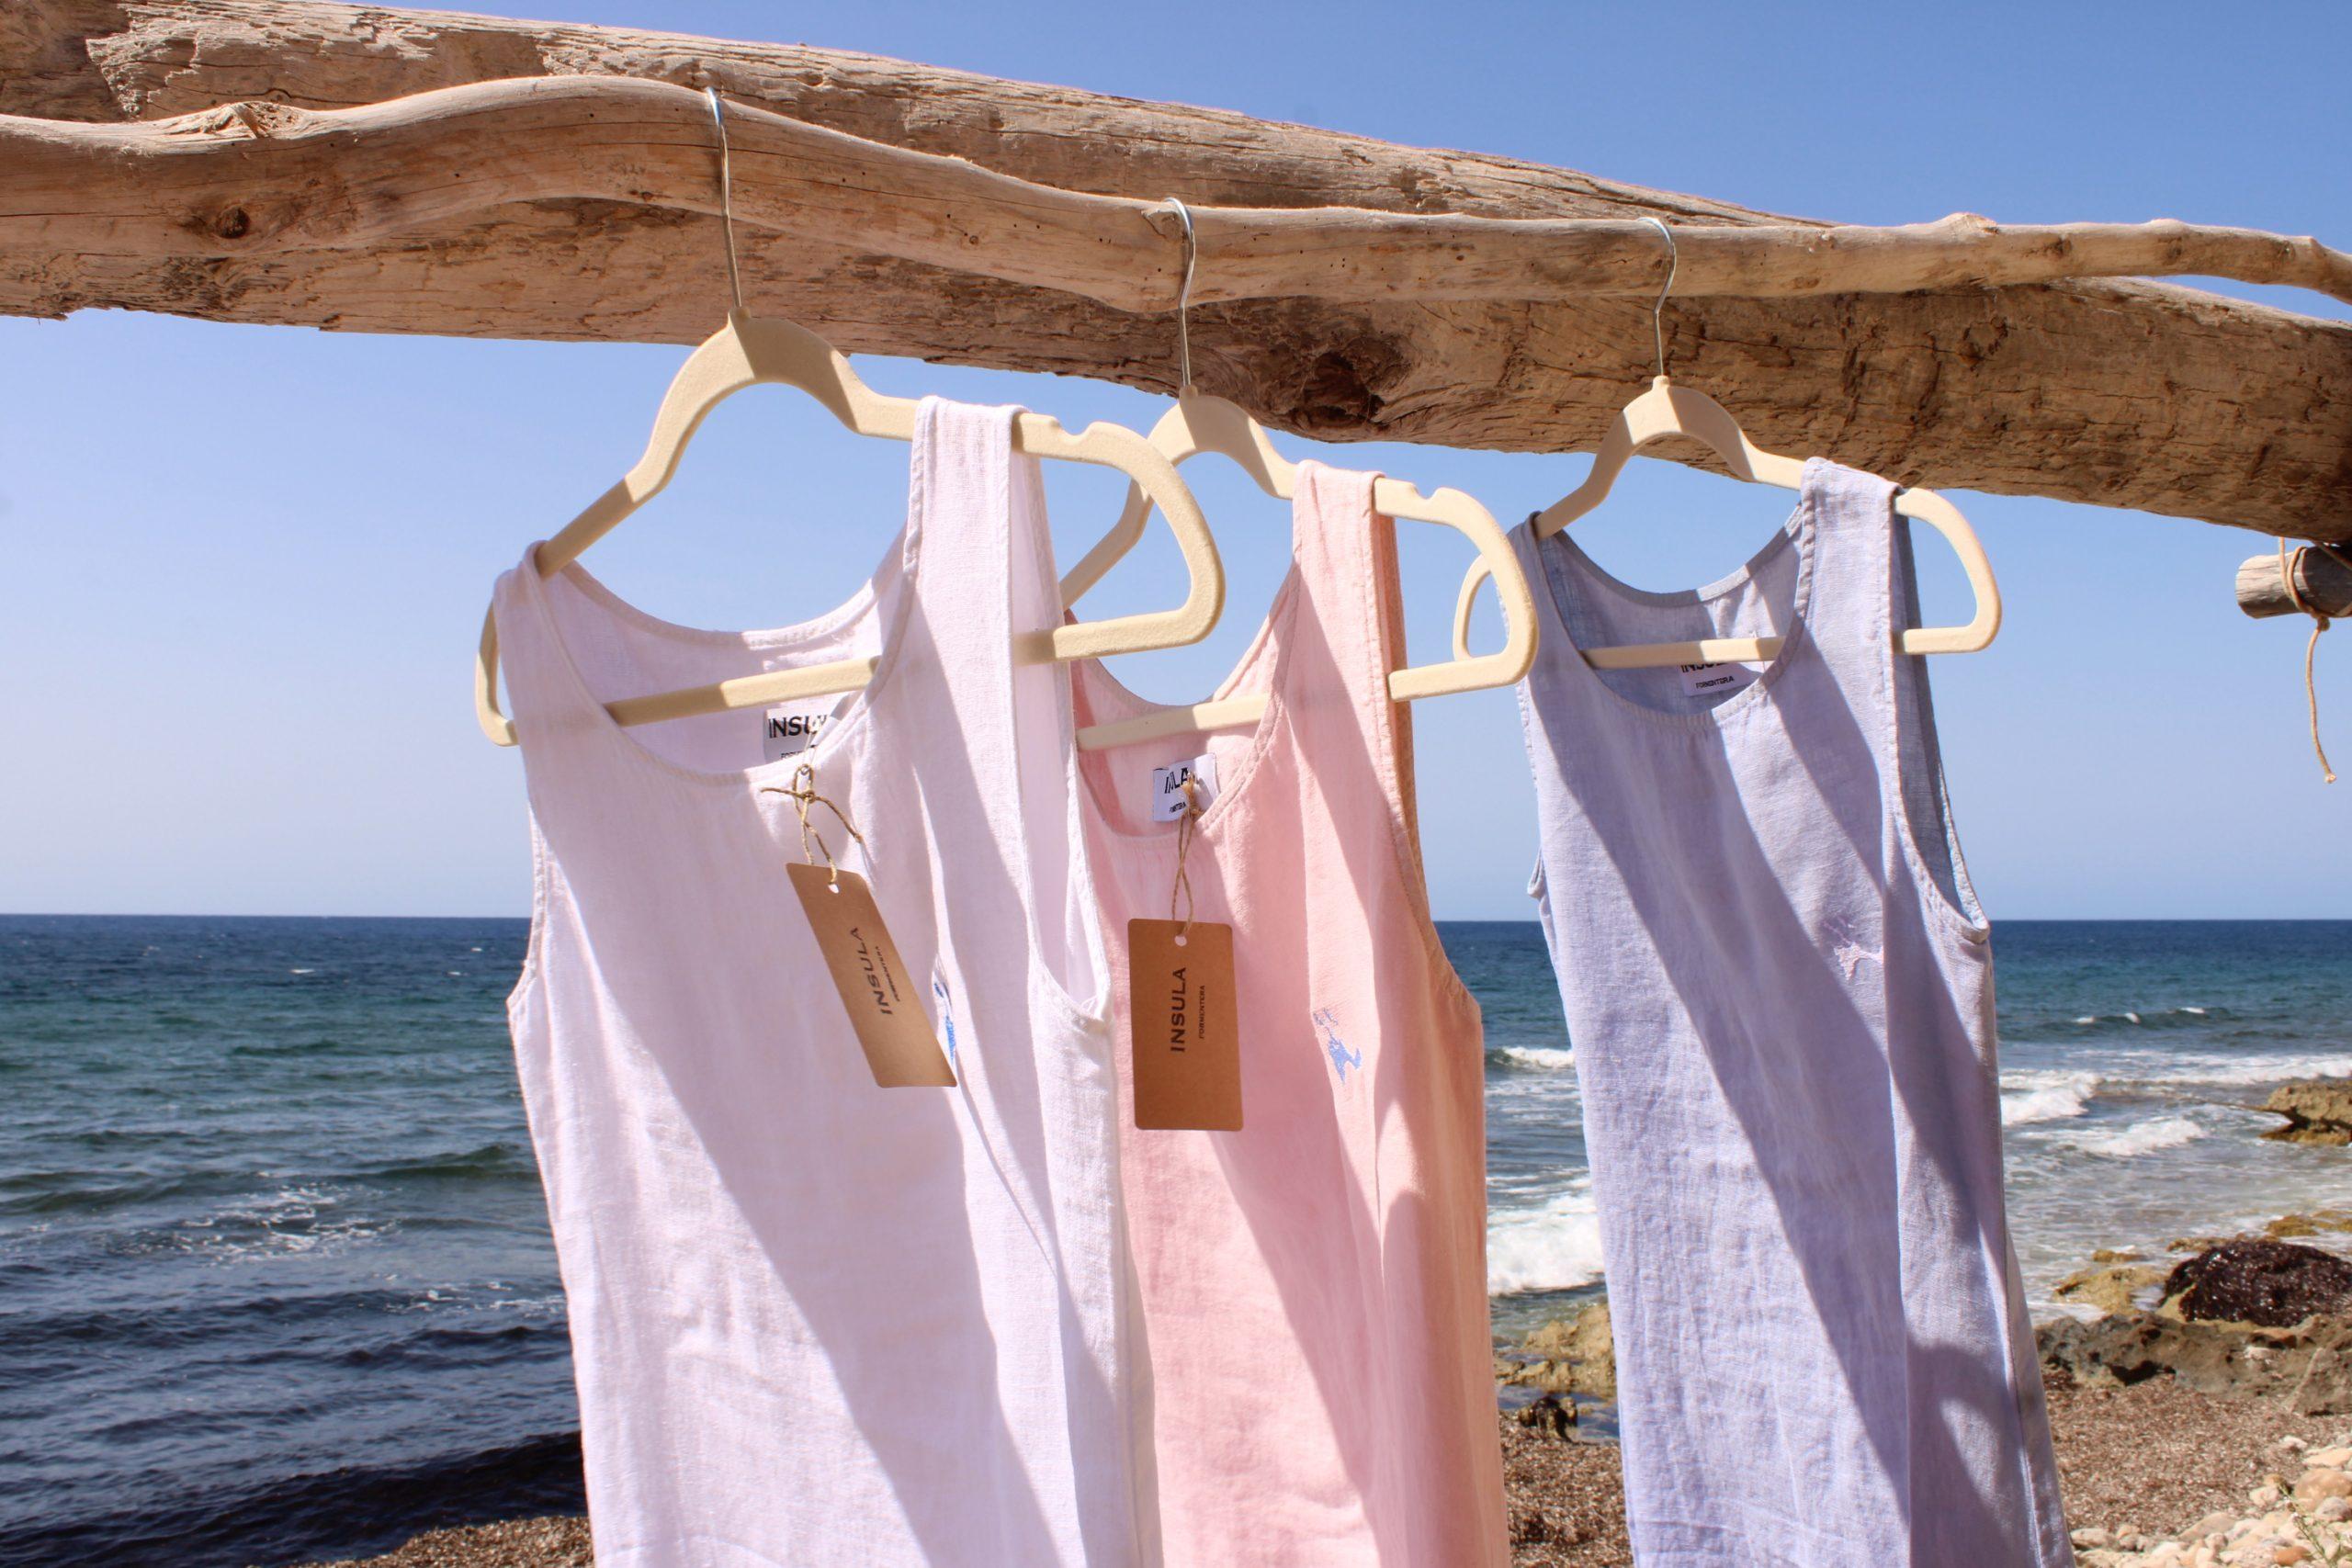 Vestidos insula lino